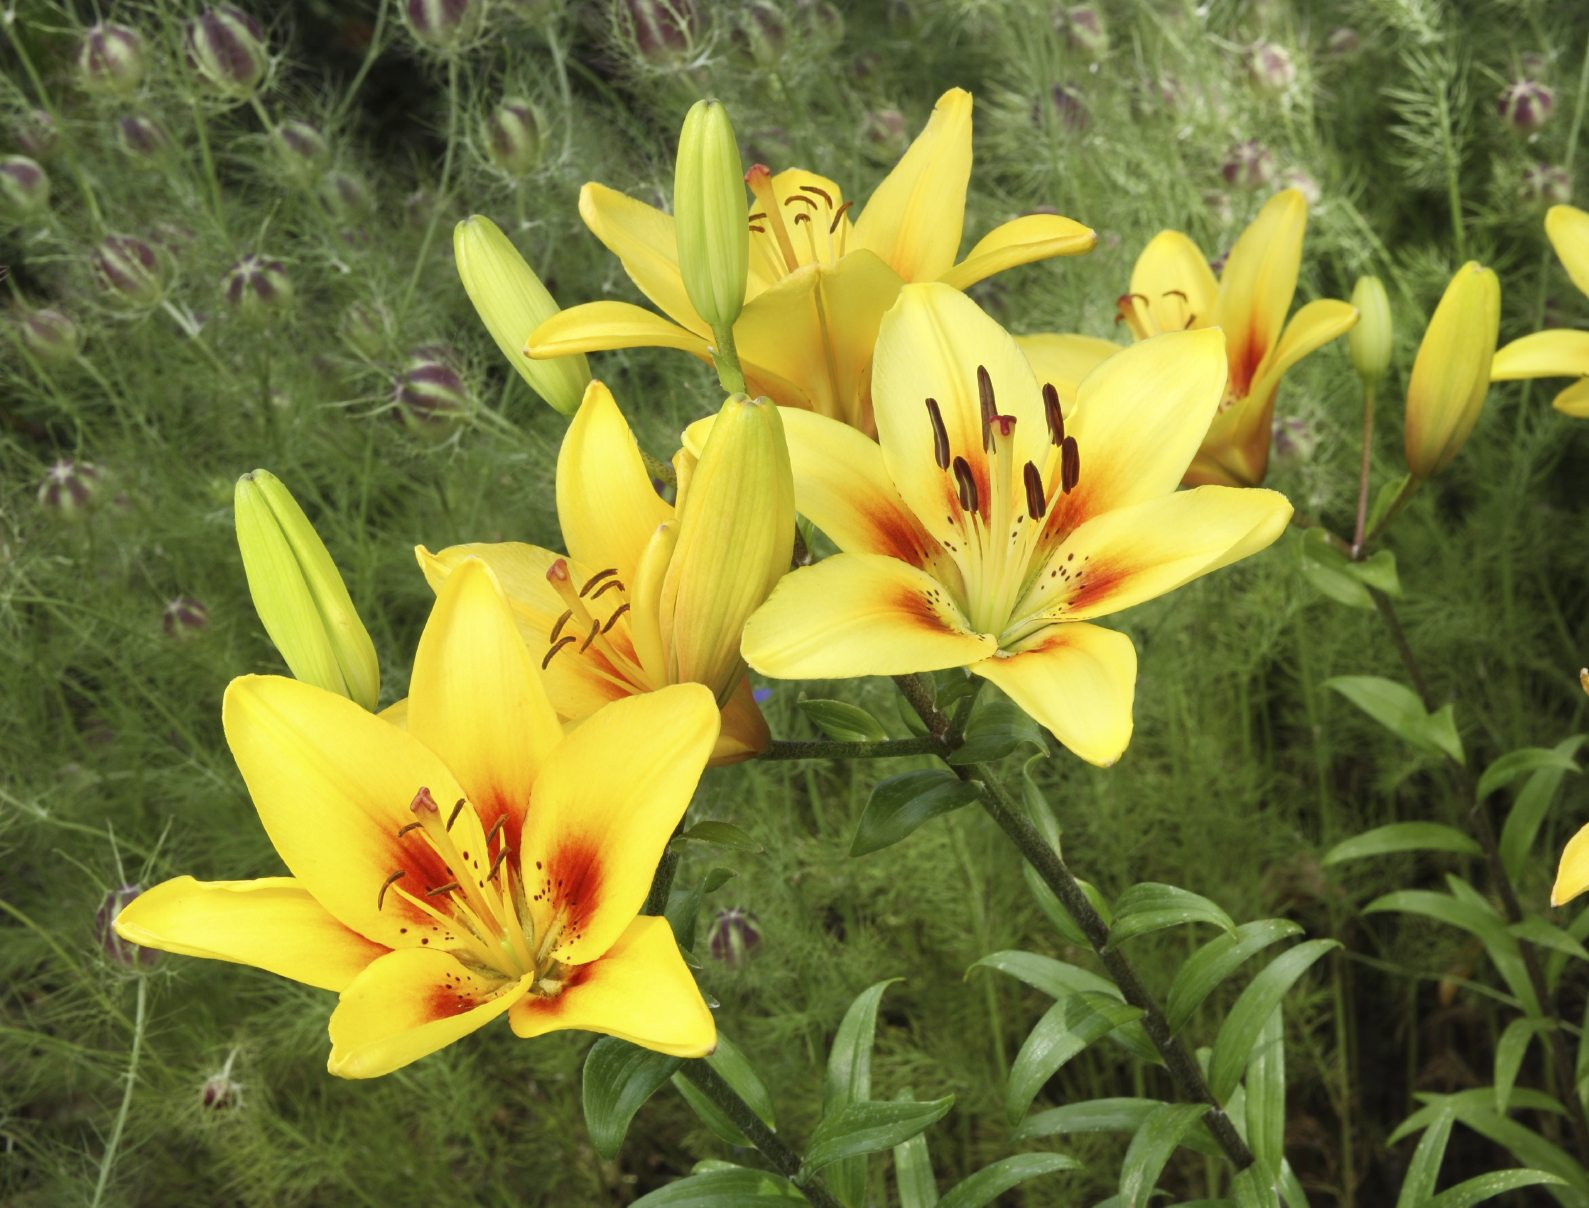 A beautiful clump of Lemon Lillies